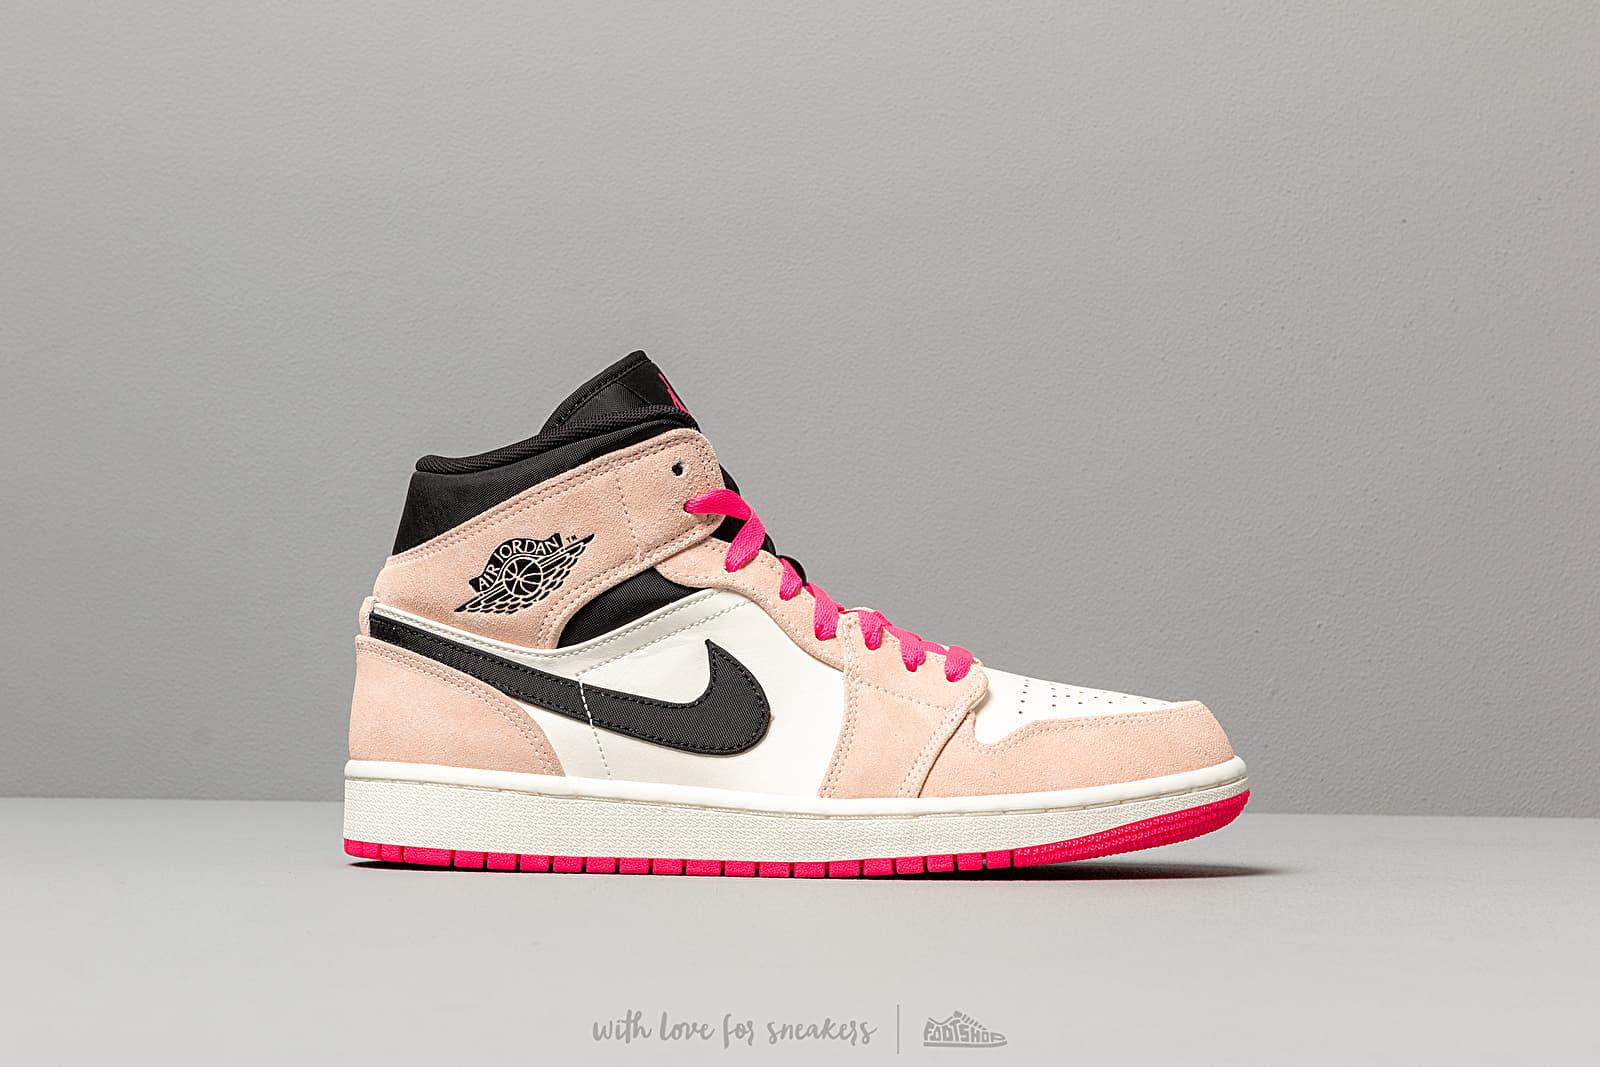 Air Jordan 1 Mid Se Crimson Tint Hyper Pink Black Sail | Footshop